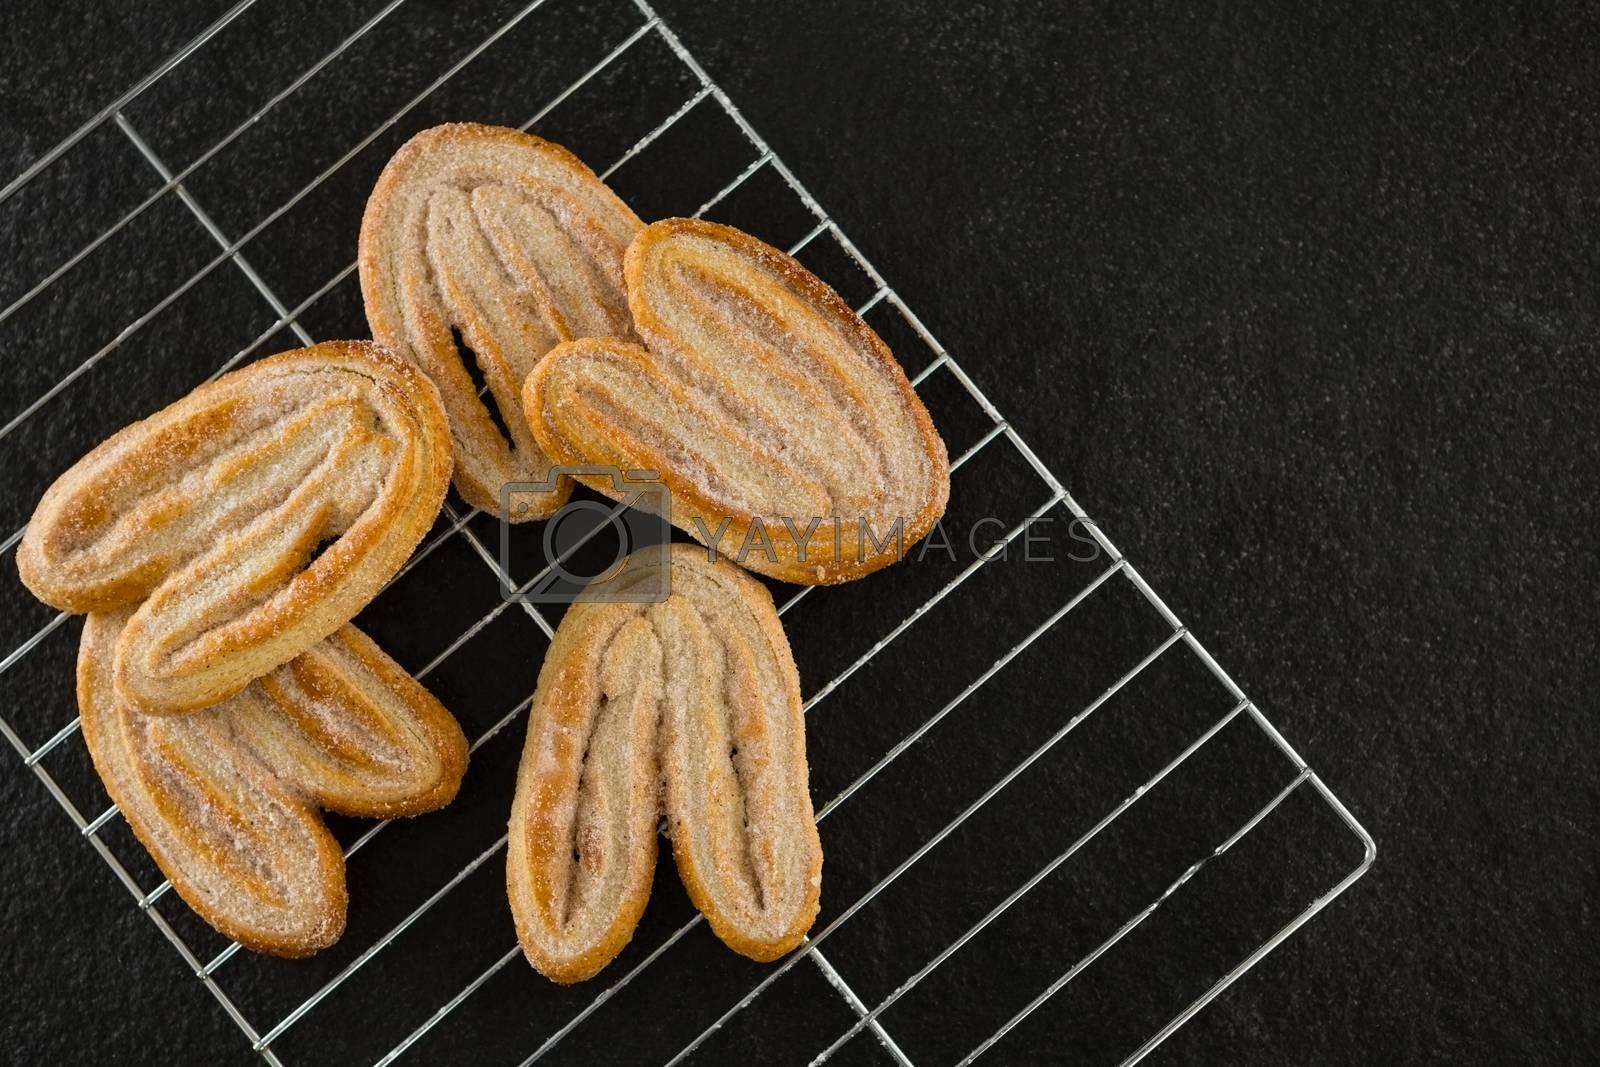 Fresh baked cookies on baking tray by Wavebreakmedia